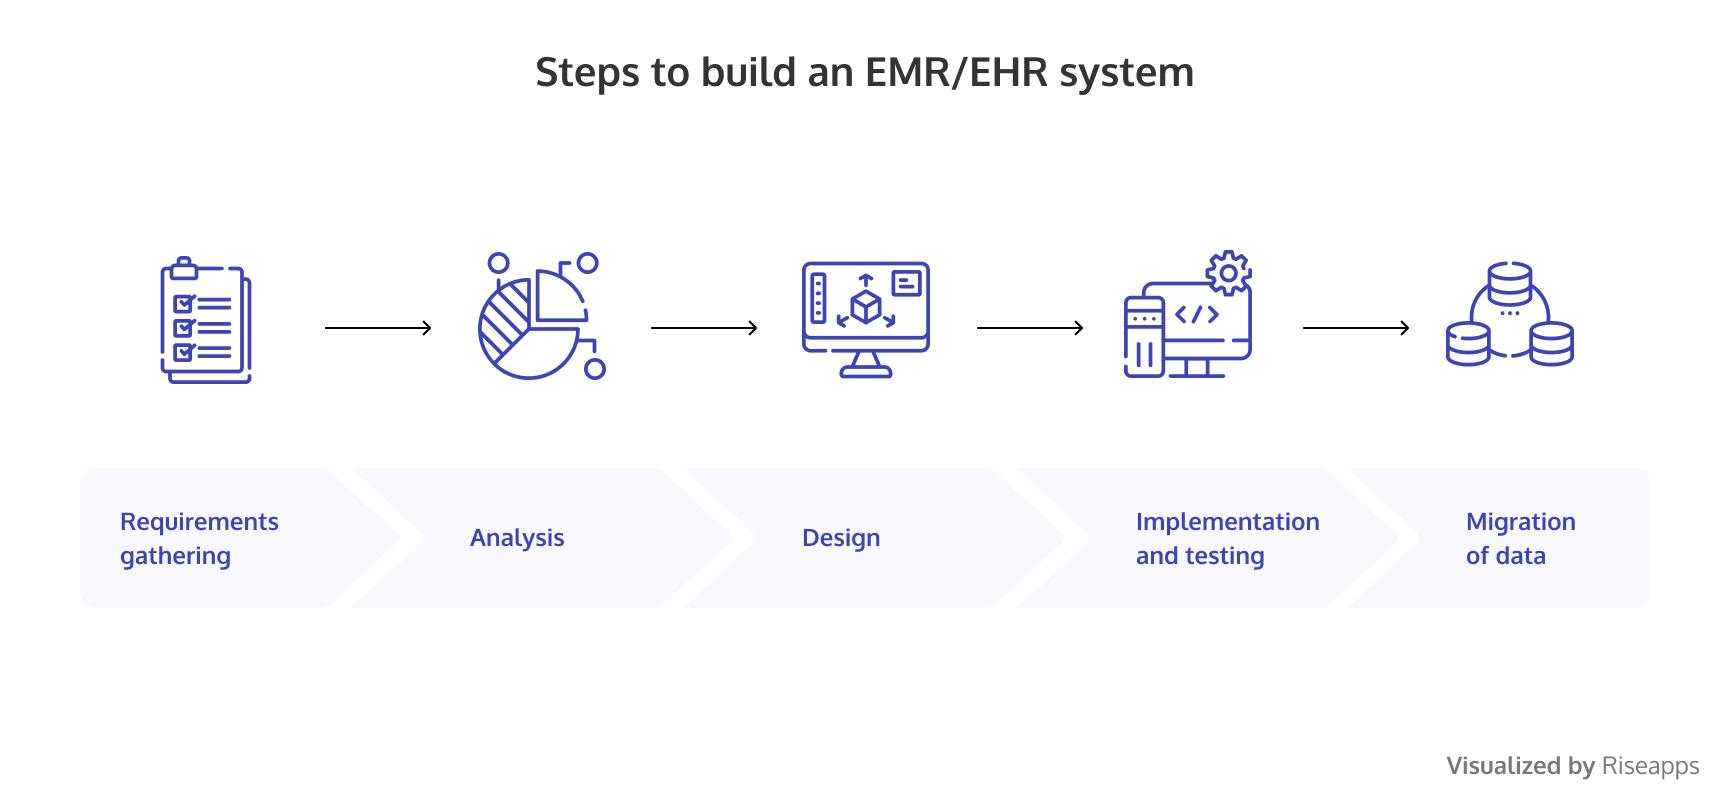 EMR and EHR development stages